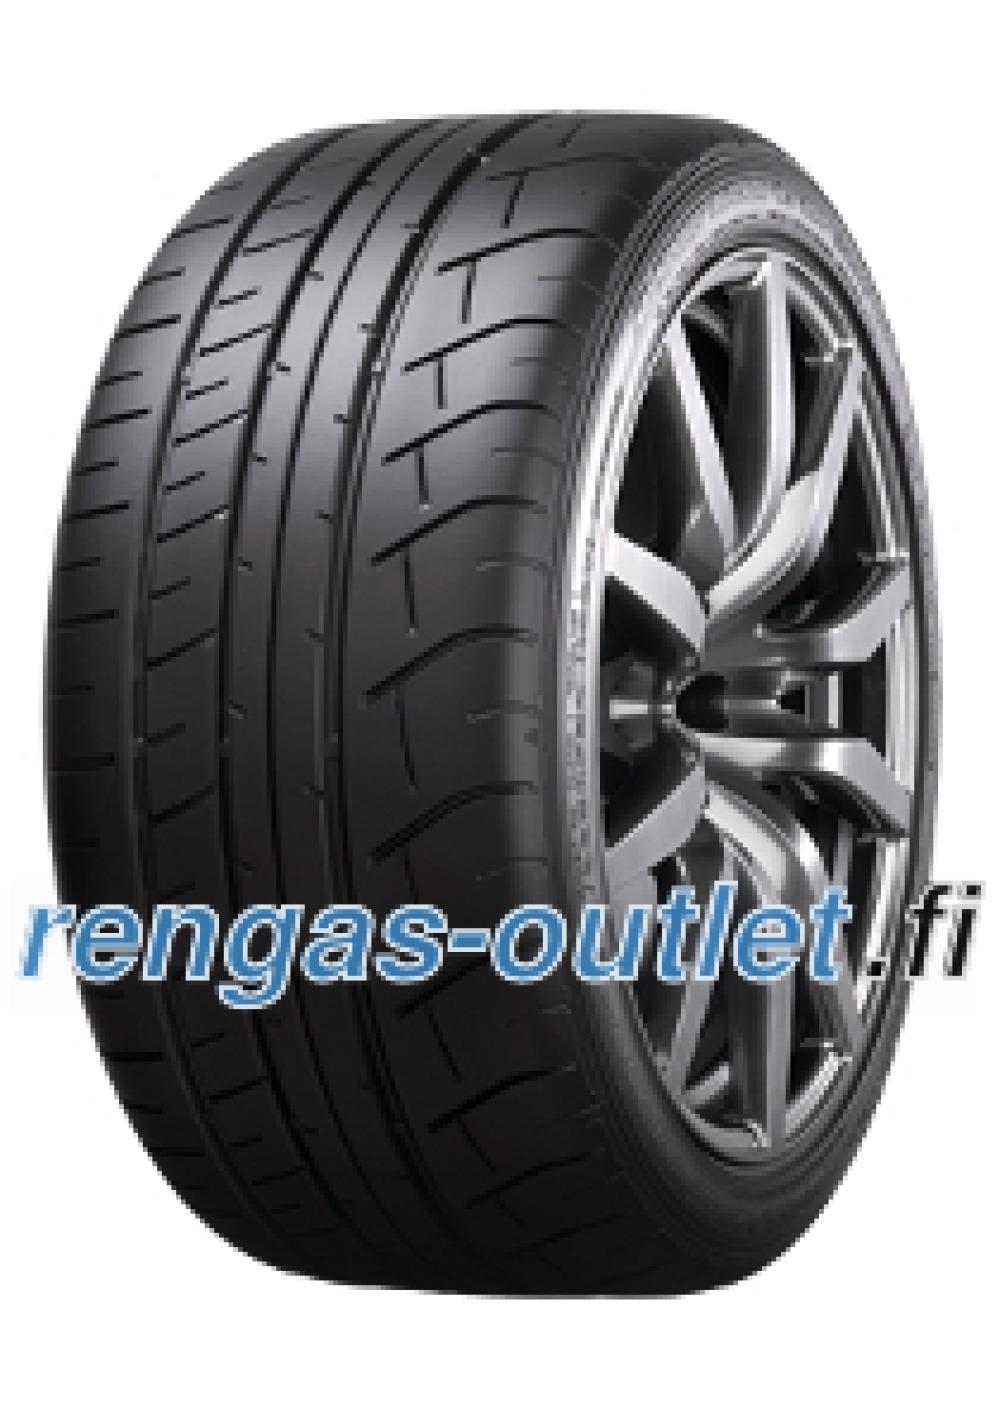 Dunlop SP Sport Maxx GT600 ROF ( 255/40 ZR20 (97Y) vannesuojalla (MFS), runflat )